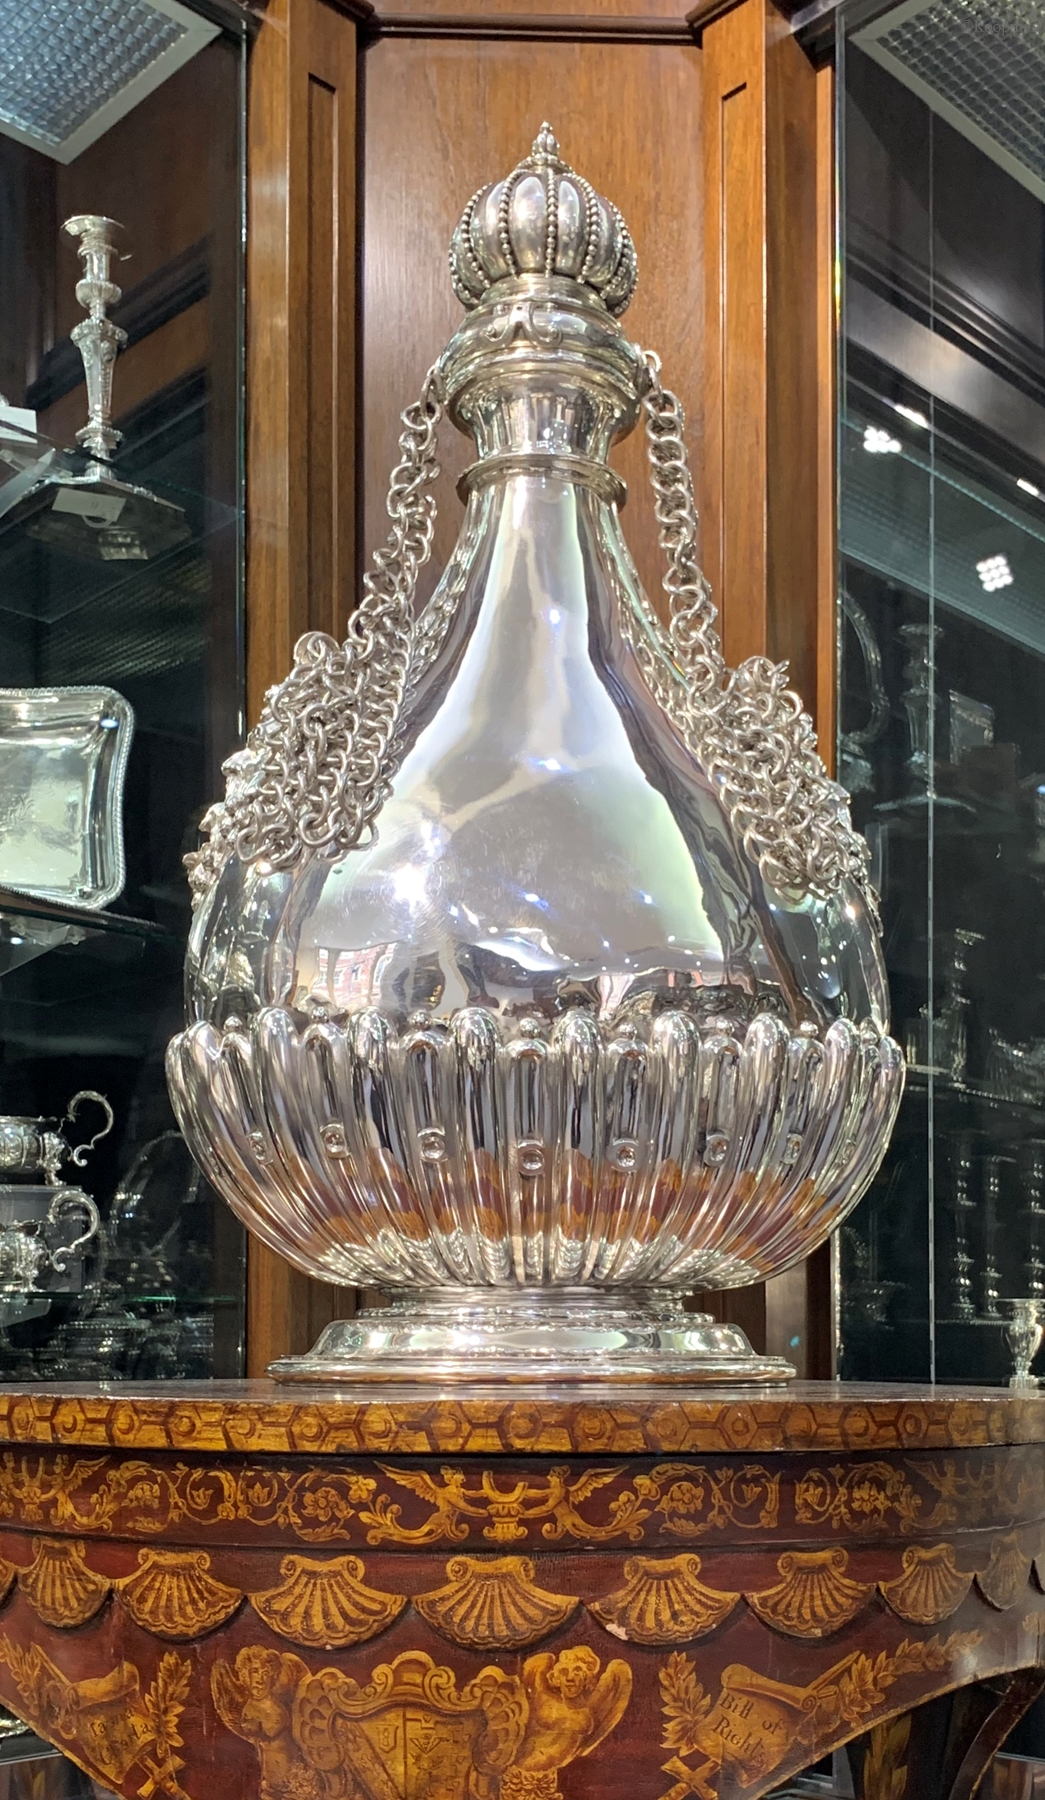 A Monumental 19th Century Pilgrim Bottle